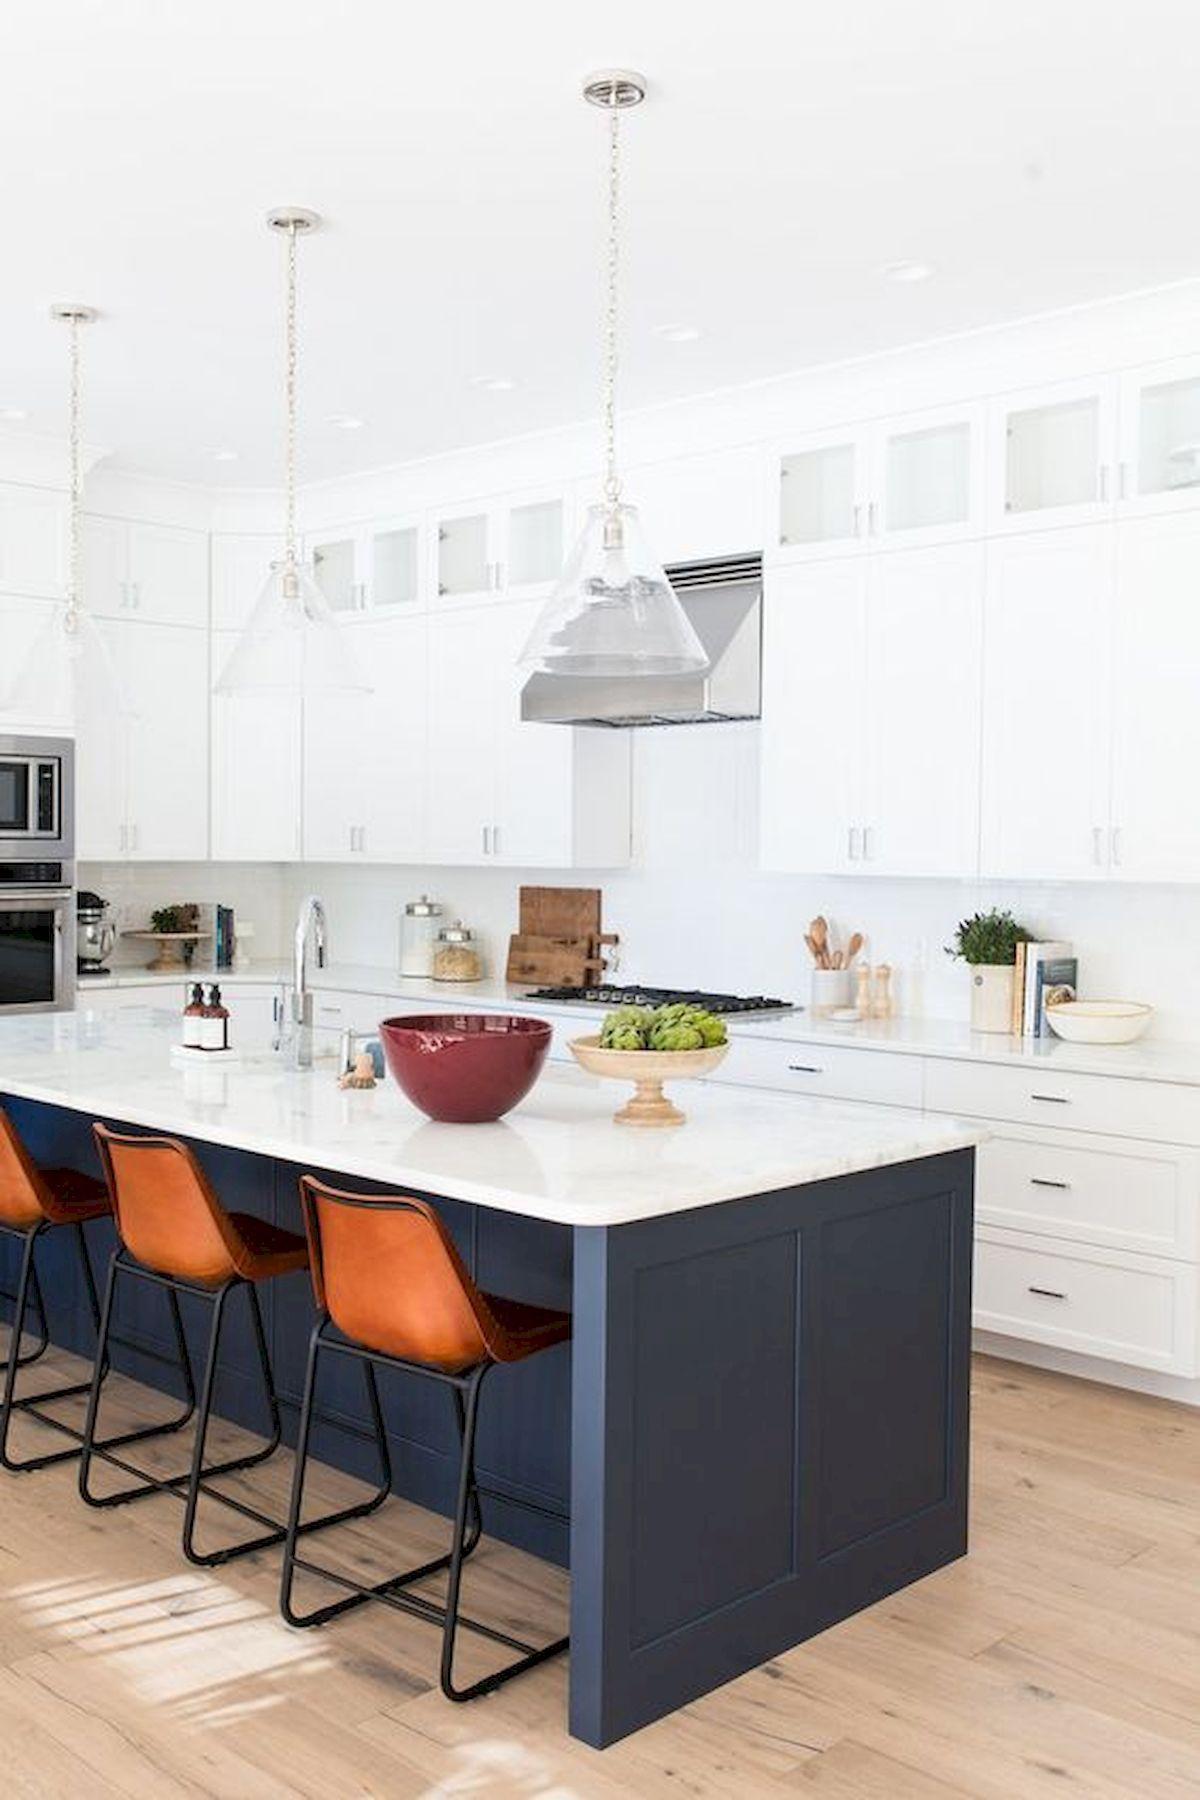 50 Stunning White Kitchen Design Ideas And Decor Carolanne News Kitchen Interior White Kitchen Decor White Kitchen Design